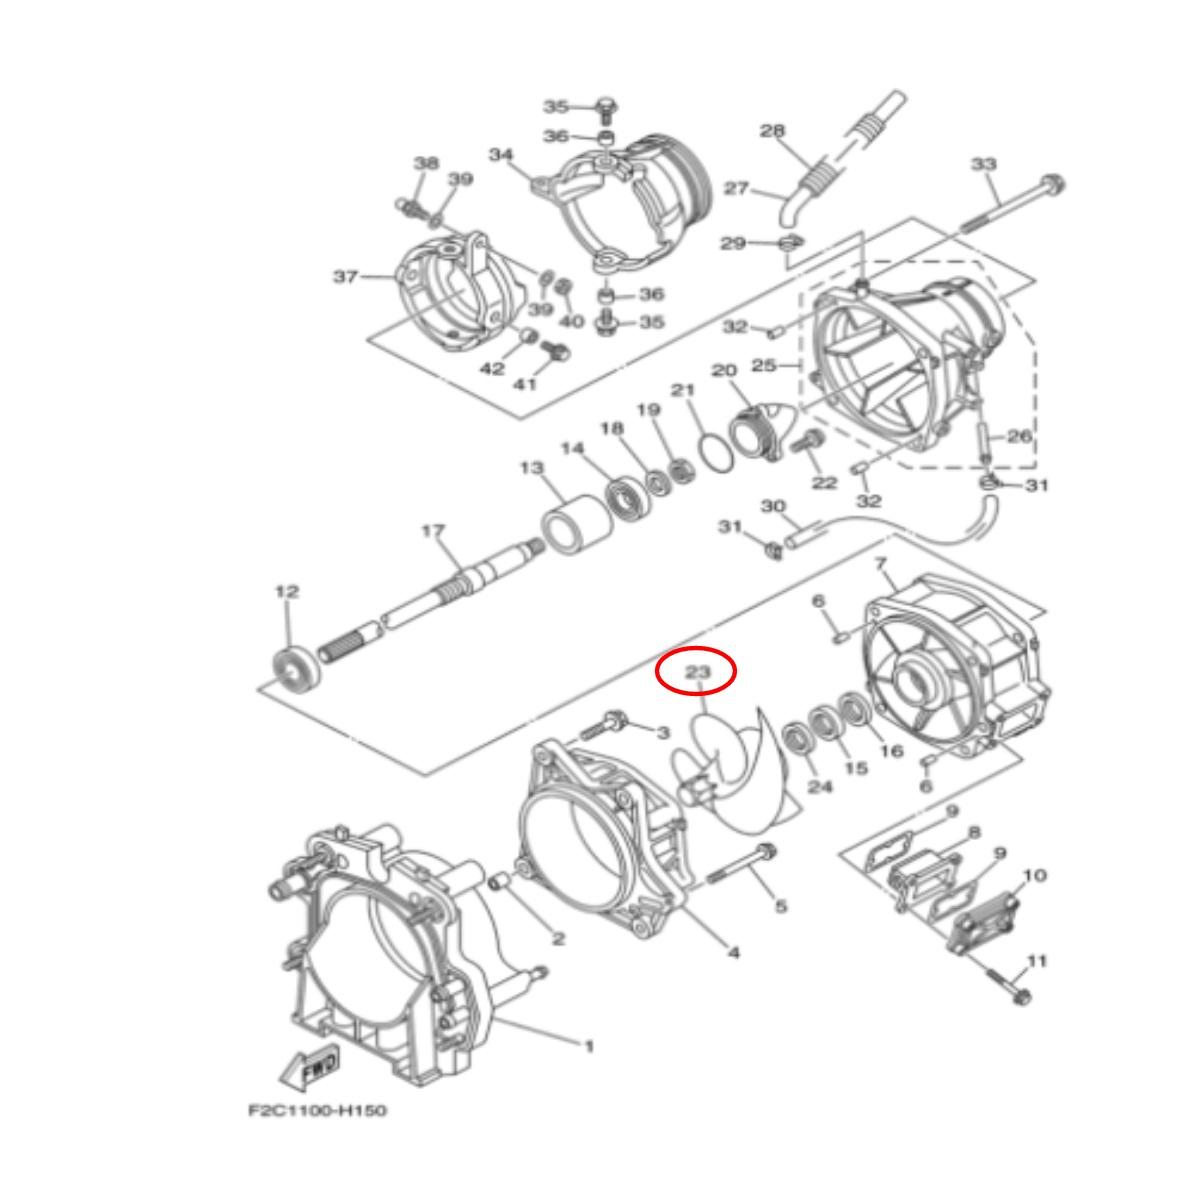 Hélice Solas para Jet Ski Yamaha 14/20 155mm Gp 1300 R 05 - Fx ho 04/08  - Radical Peças - Peças para Jet Ski